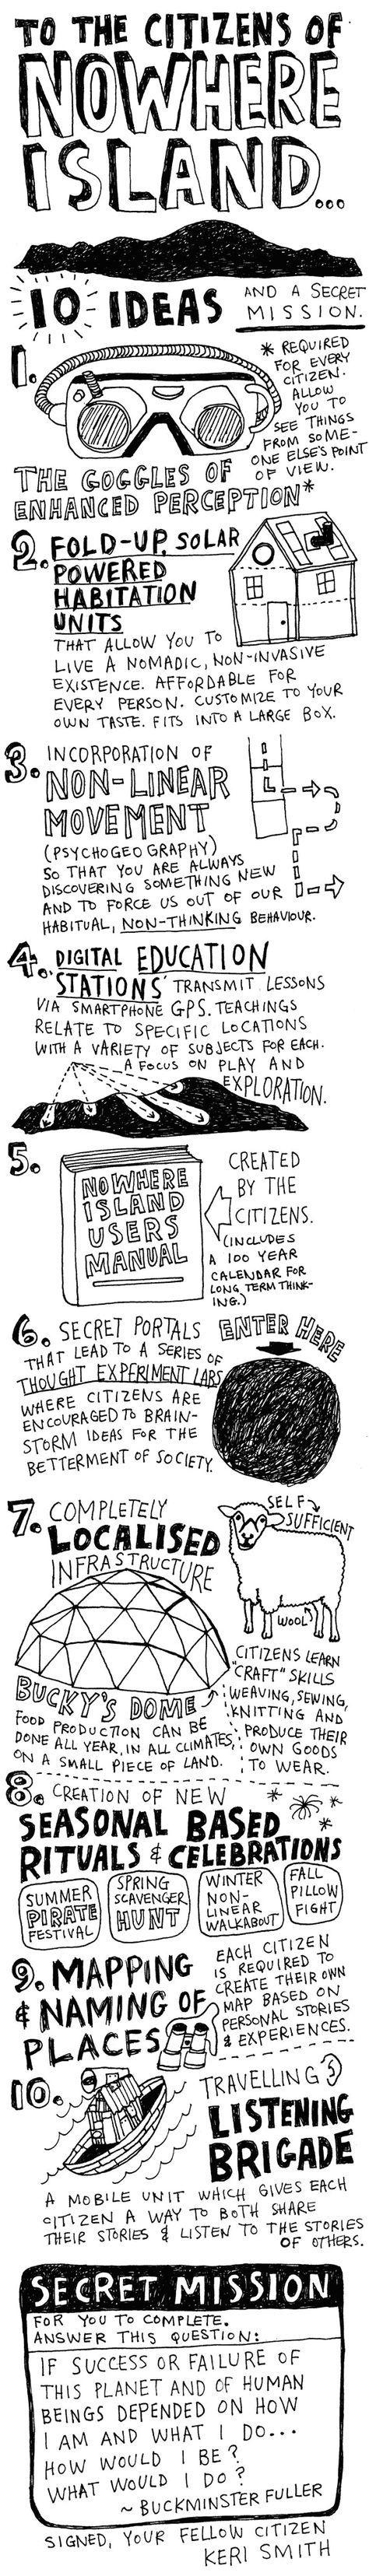 Nowhere Island -- 10 Ideas by Keri Smith